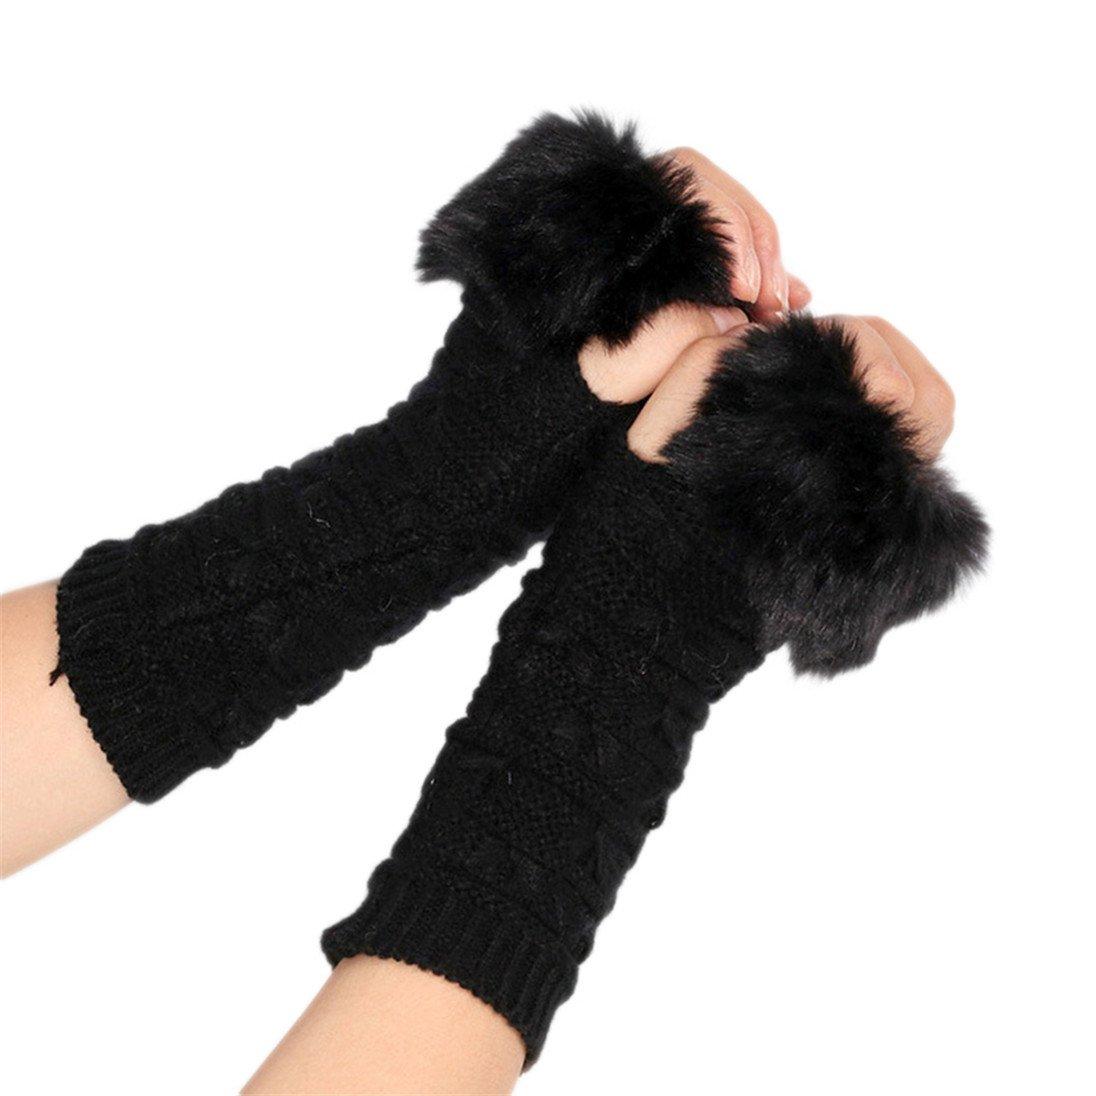 Colorido Women Fashion Winter Faux Fur Half Fingerless Indoor Knitting Gloves Mitten size Regular (Black)